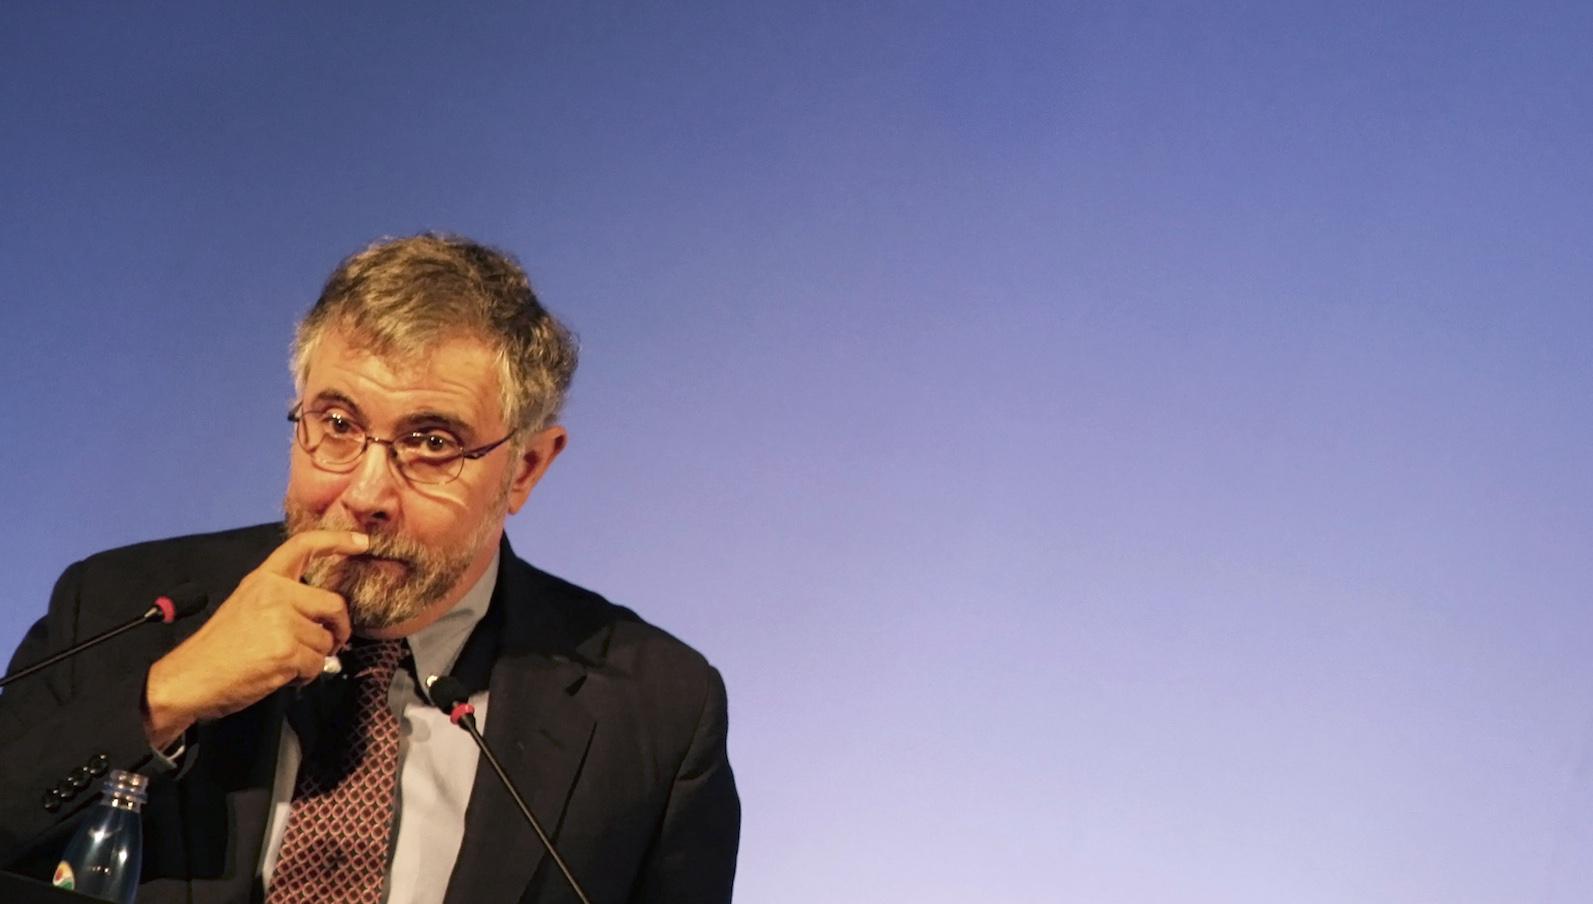 Paul Krugman's CUNY raise bad for American higher education